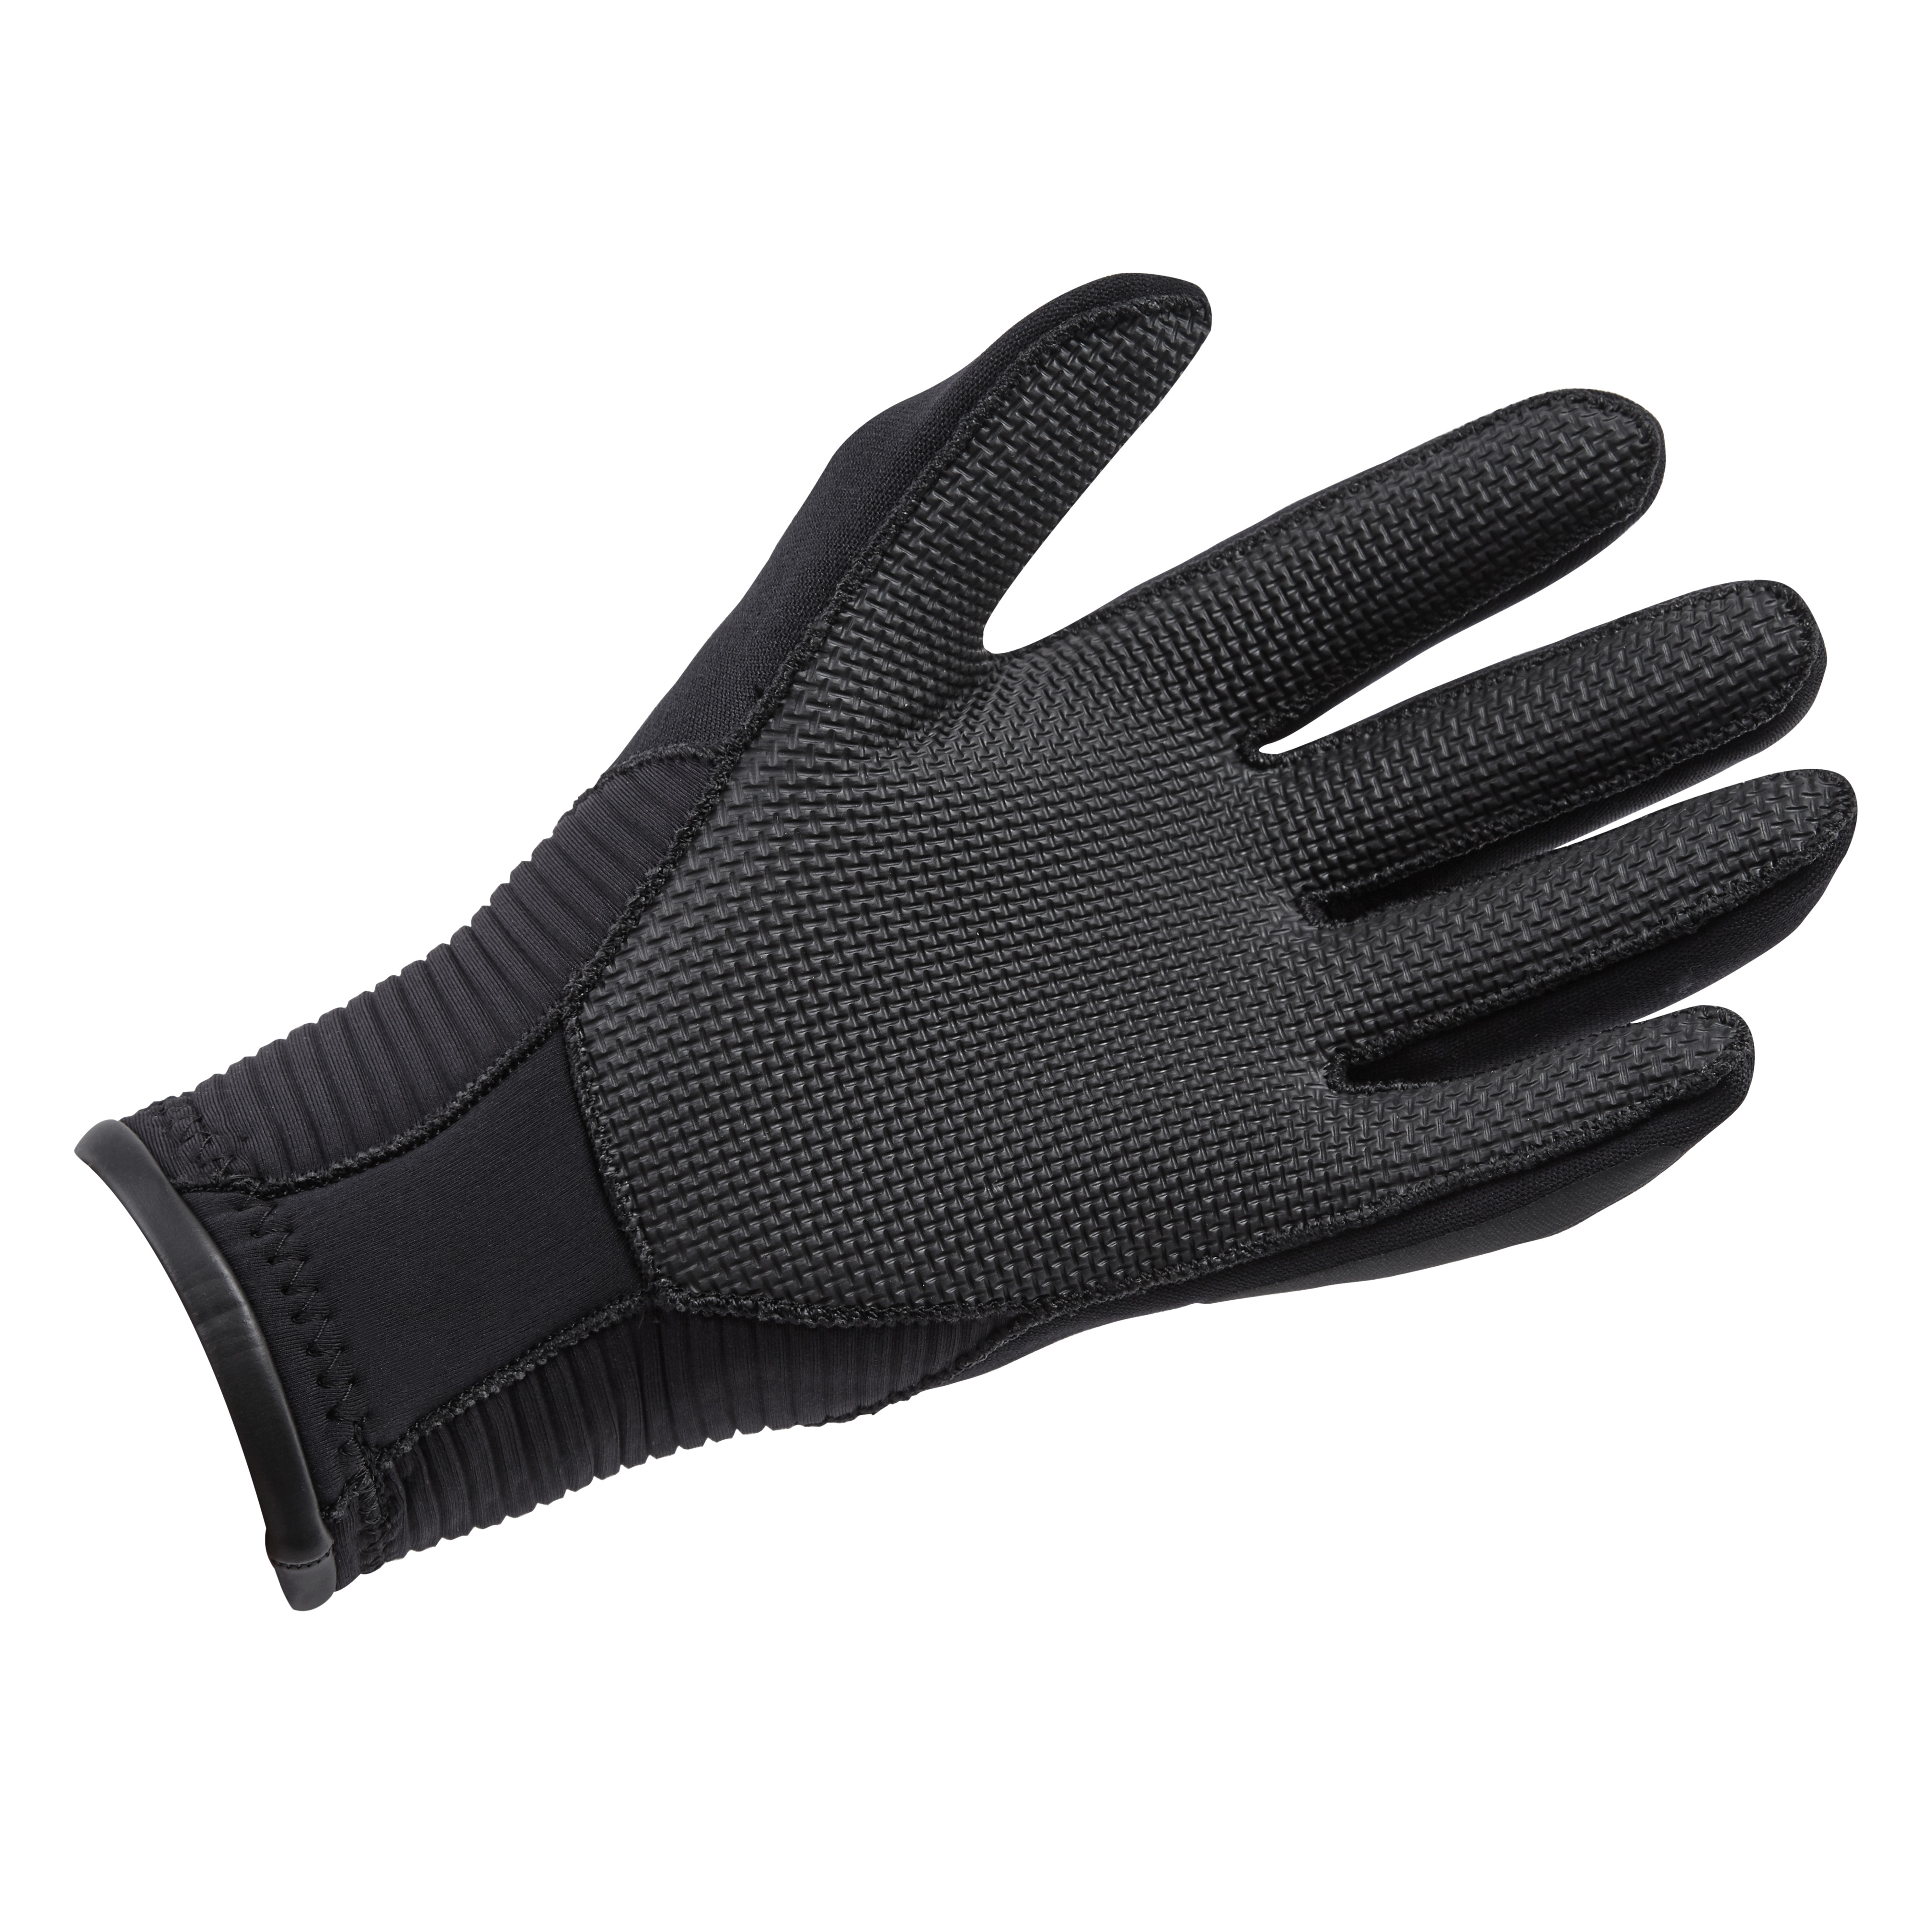 Junior Neoprene Winter Glove - 7672J-BLK01-2.jpg